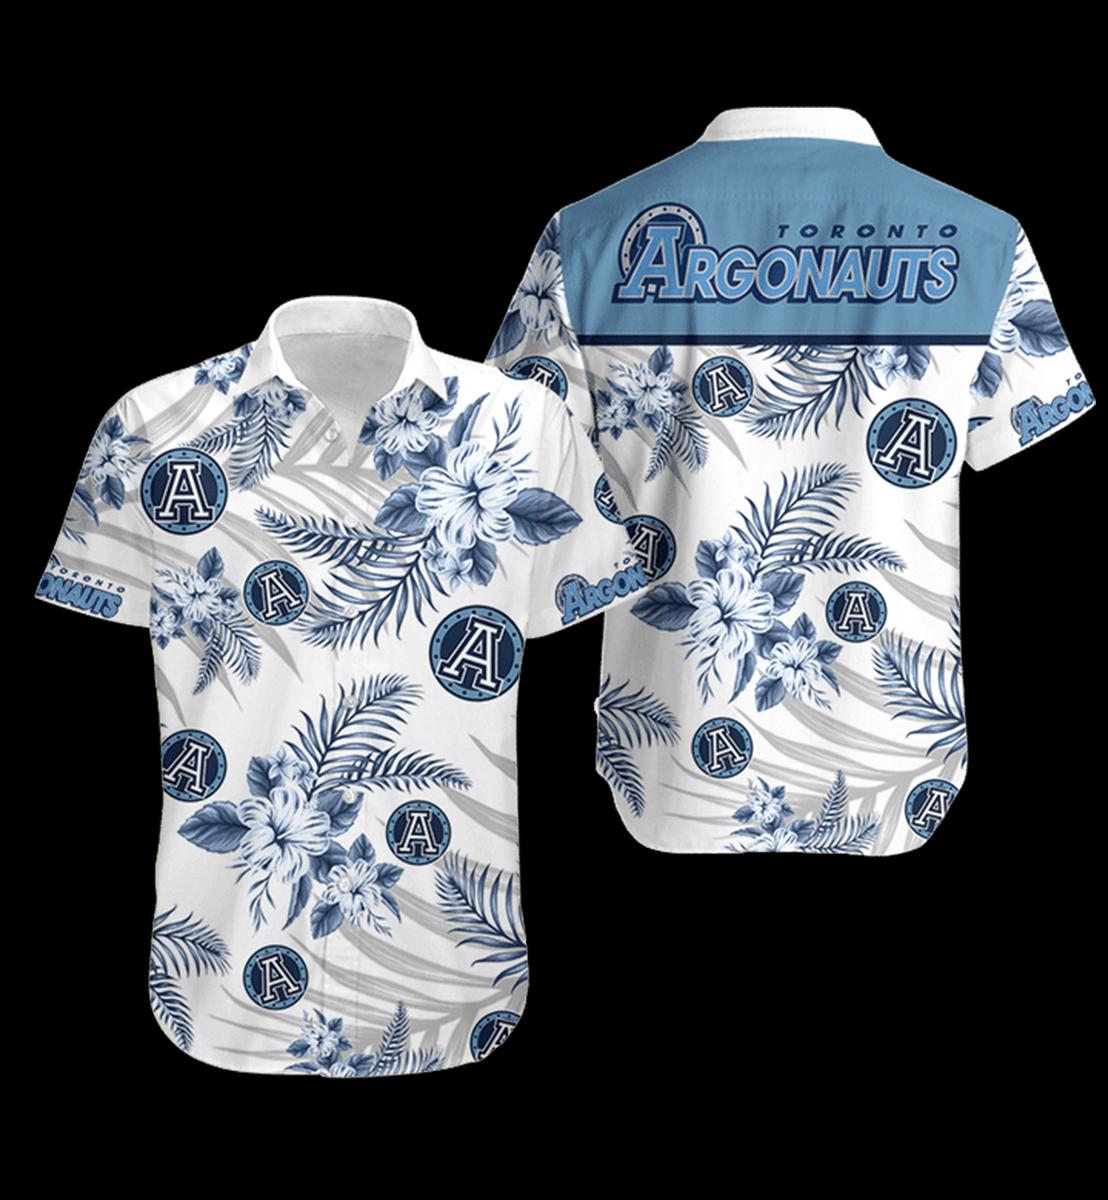 14 Toronto Argonauts Hawaiian Shirt 1 1